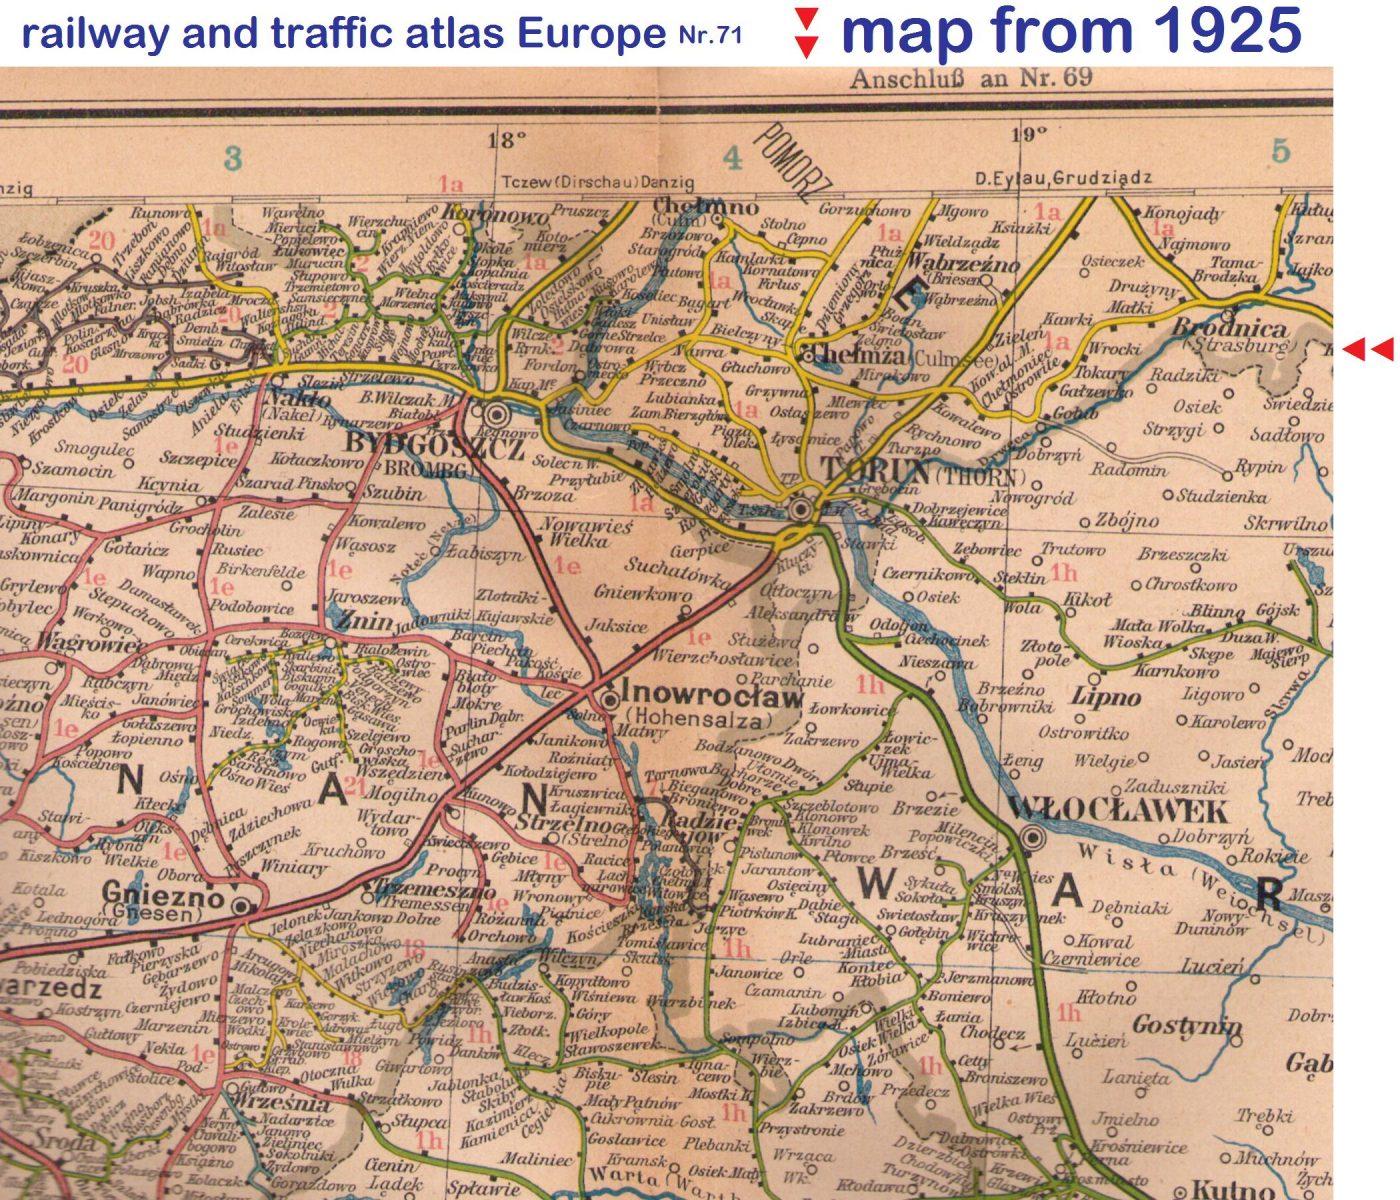 Culmsee 1925 Eisenbahn- u Verkehrsatlas cut